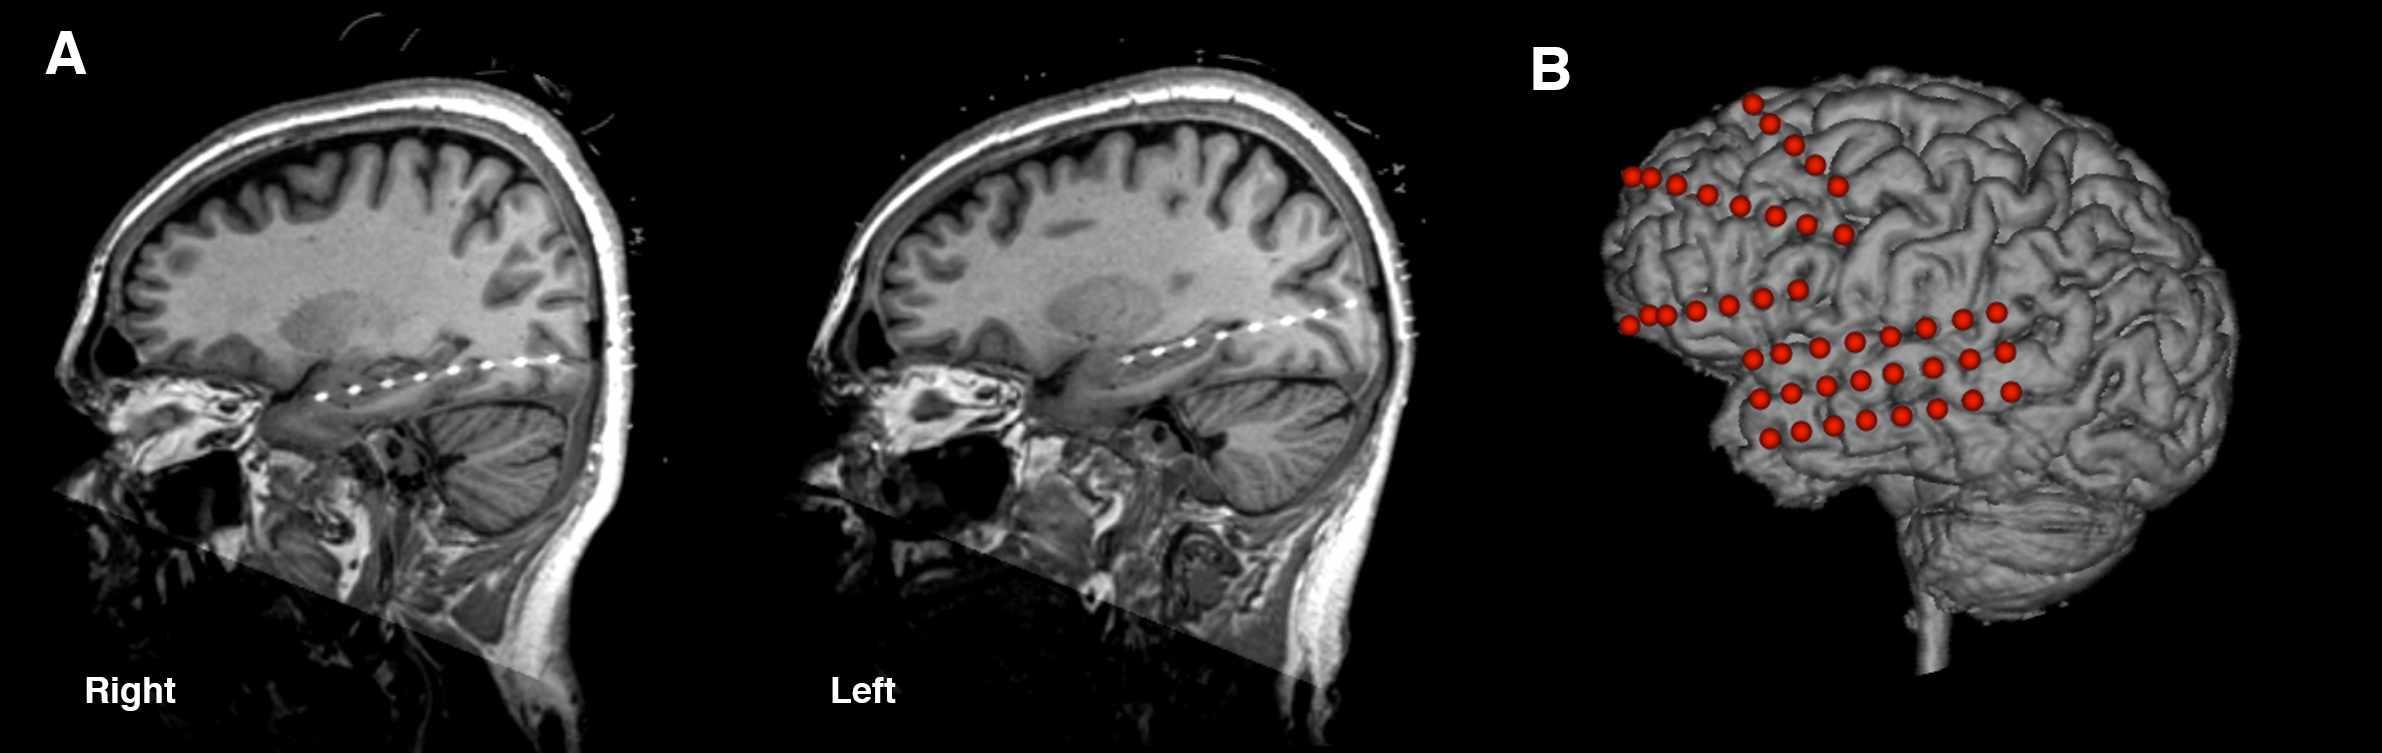 MRI of the brain